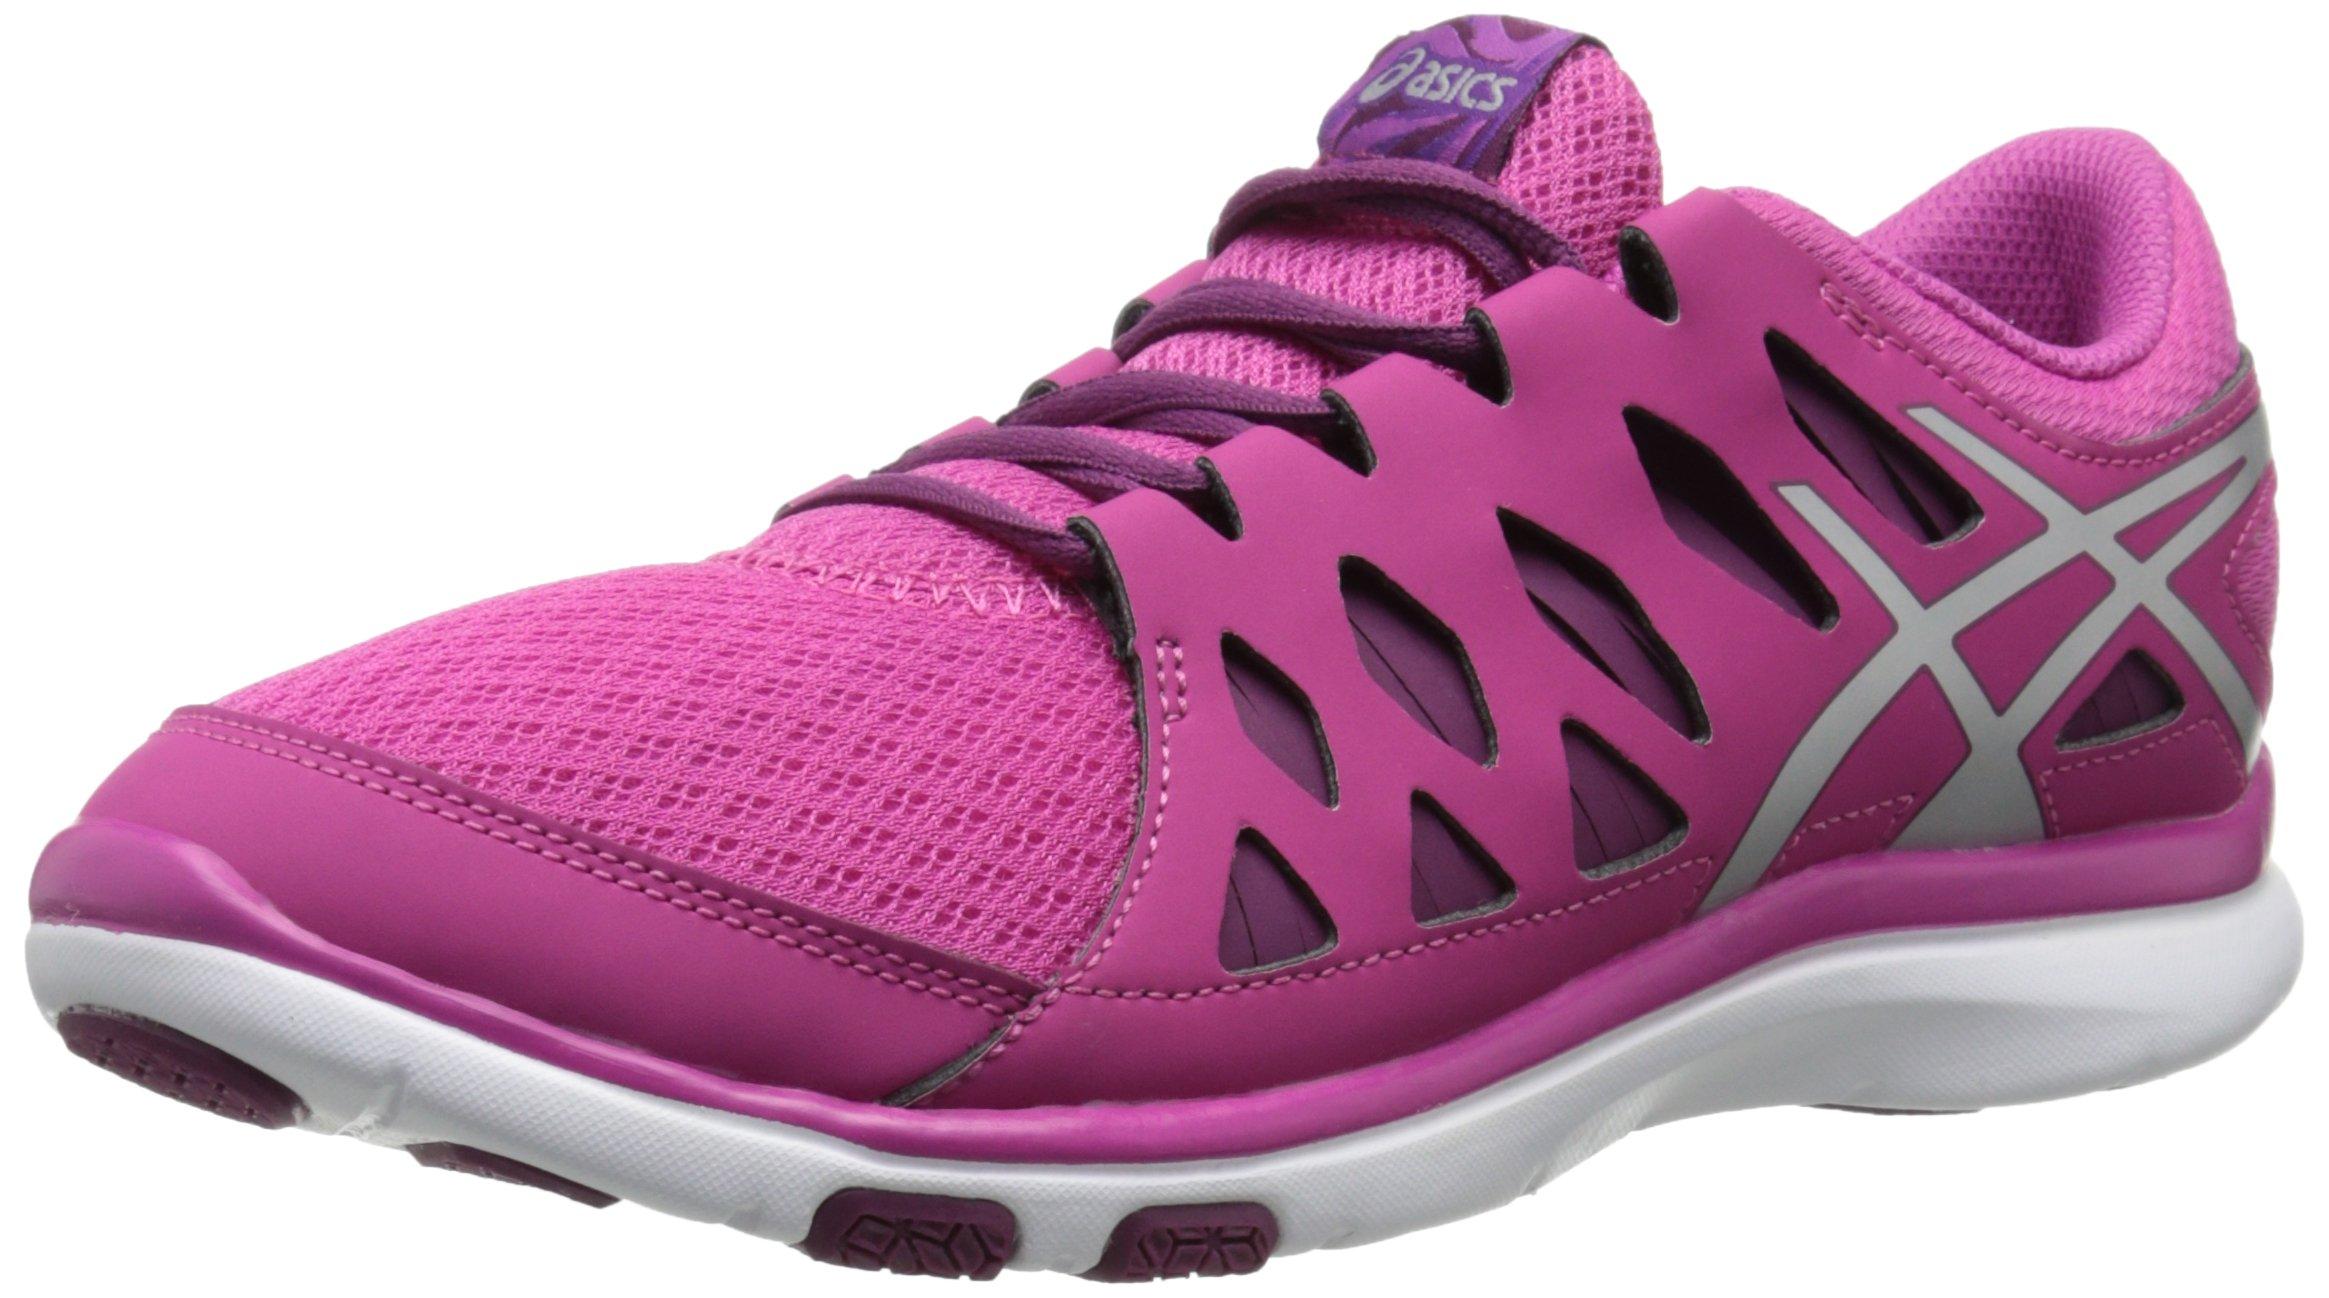 ASICS Women's GEL Fit Tempo 2 Fitness Shoe, Berry/Silver/Plum, 6.5 M US